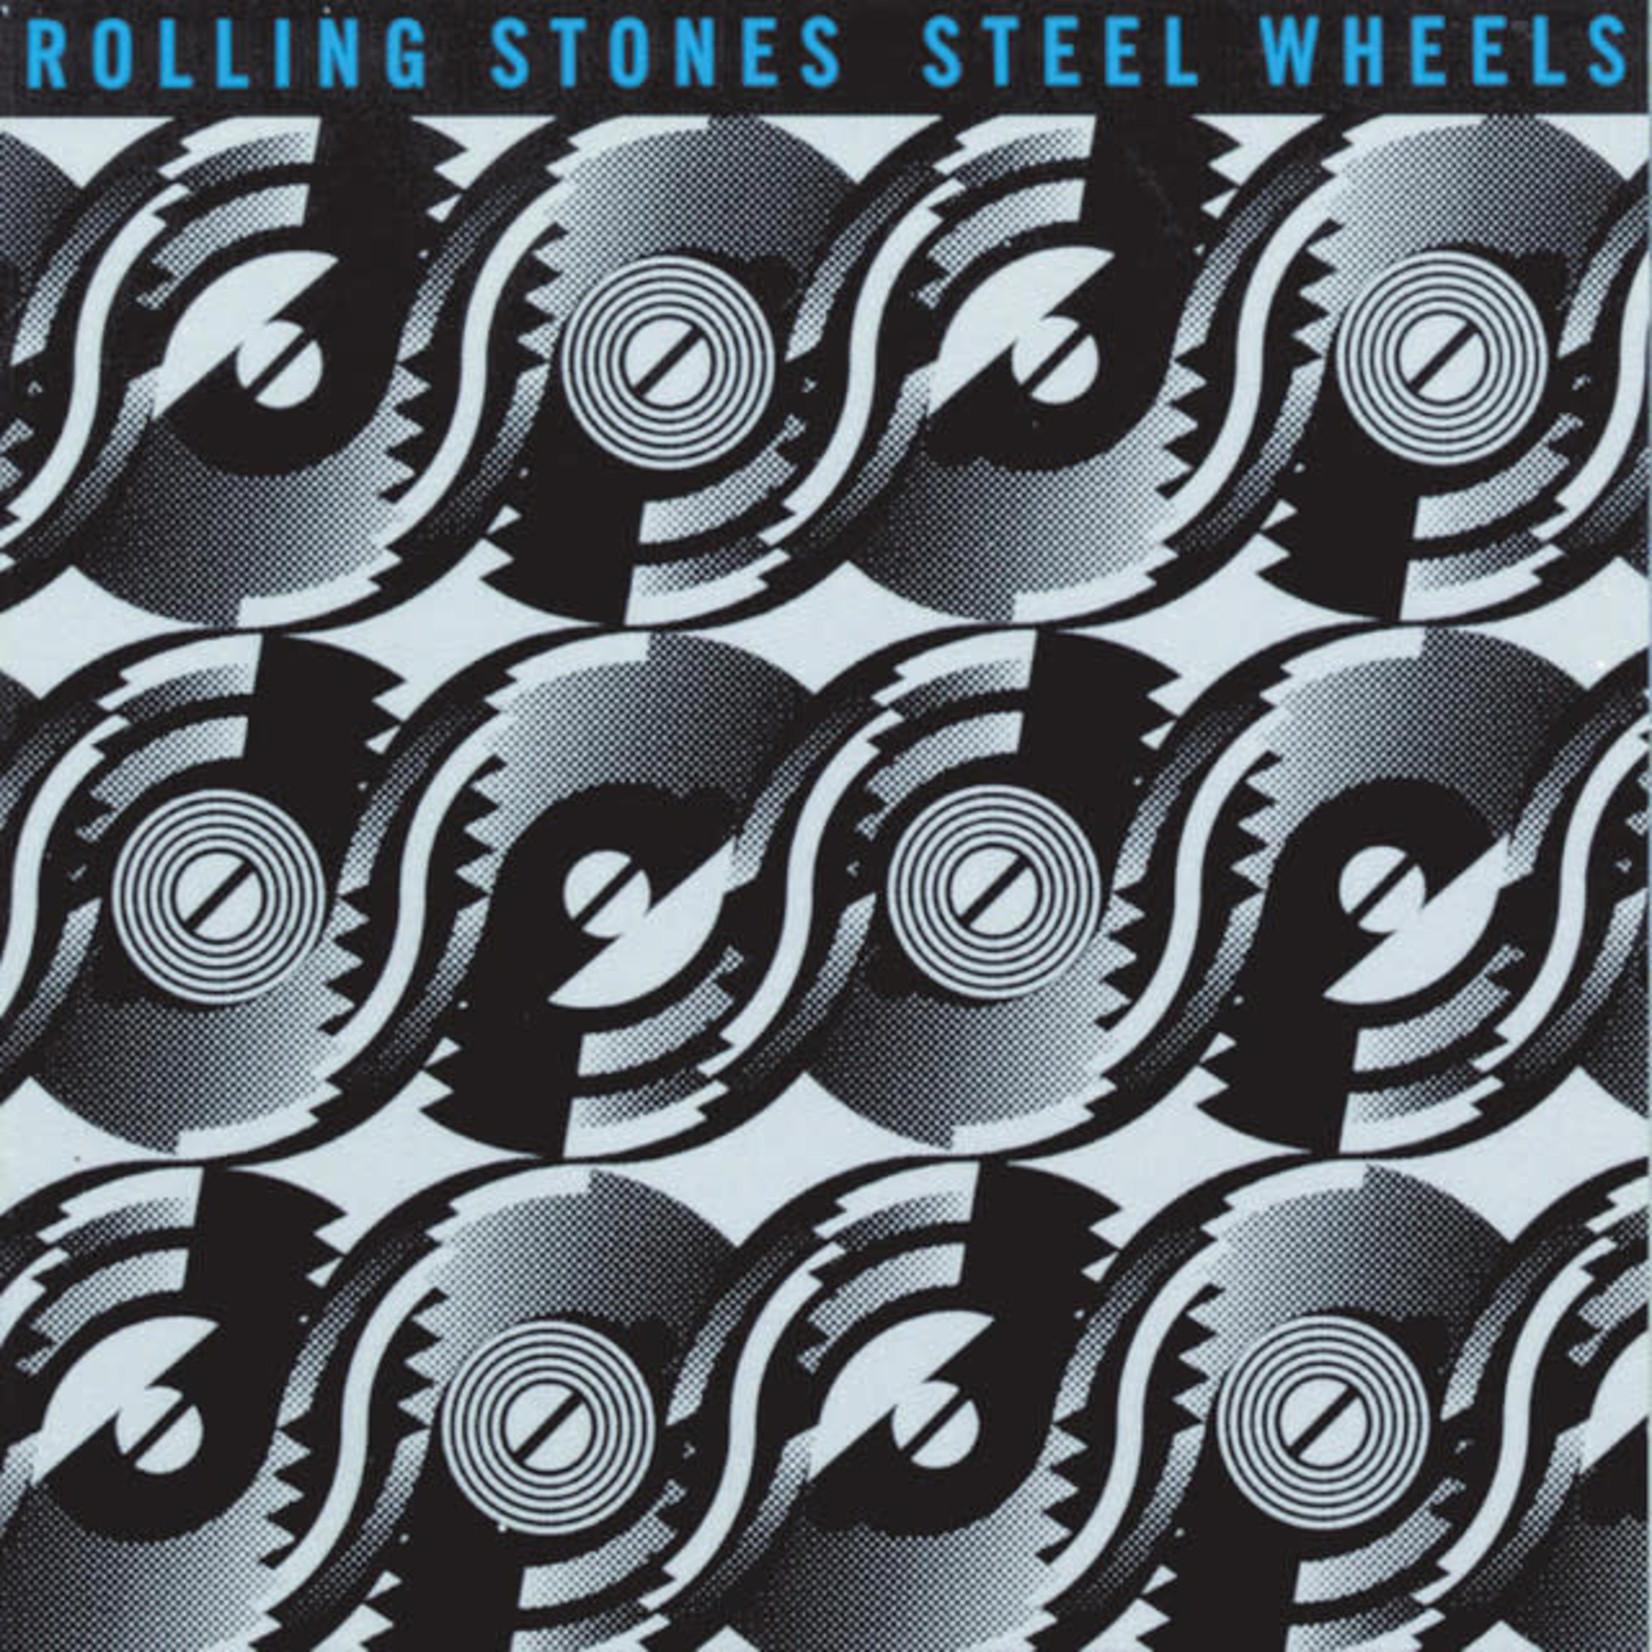 Vinyl The Rolling Stones - Steel Wheels (Half Speed Mastered)